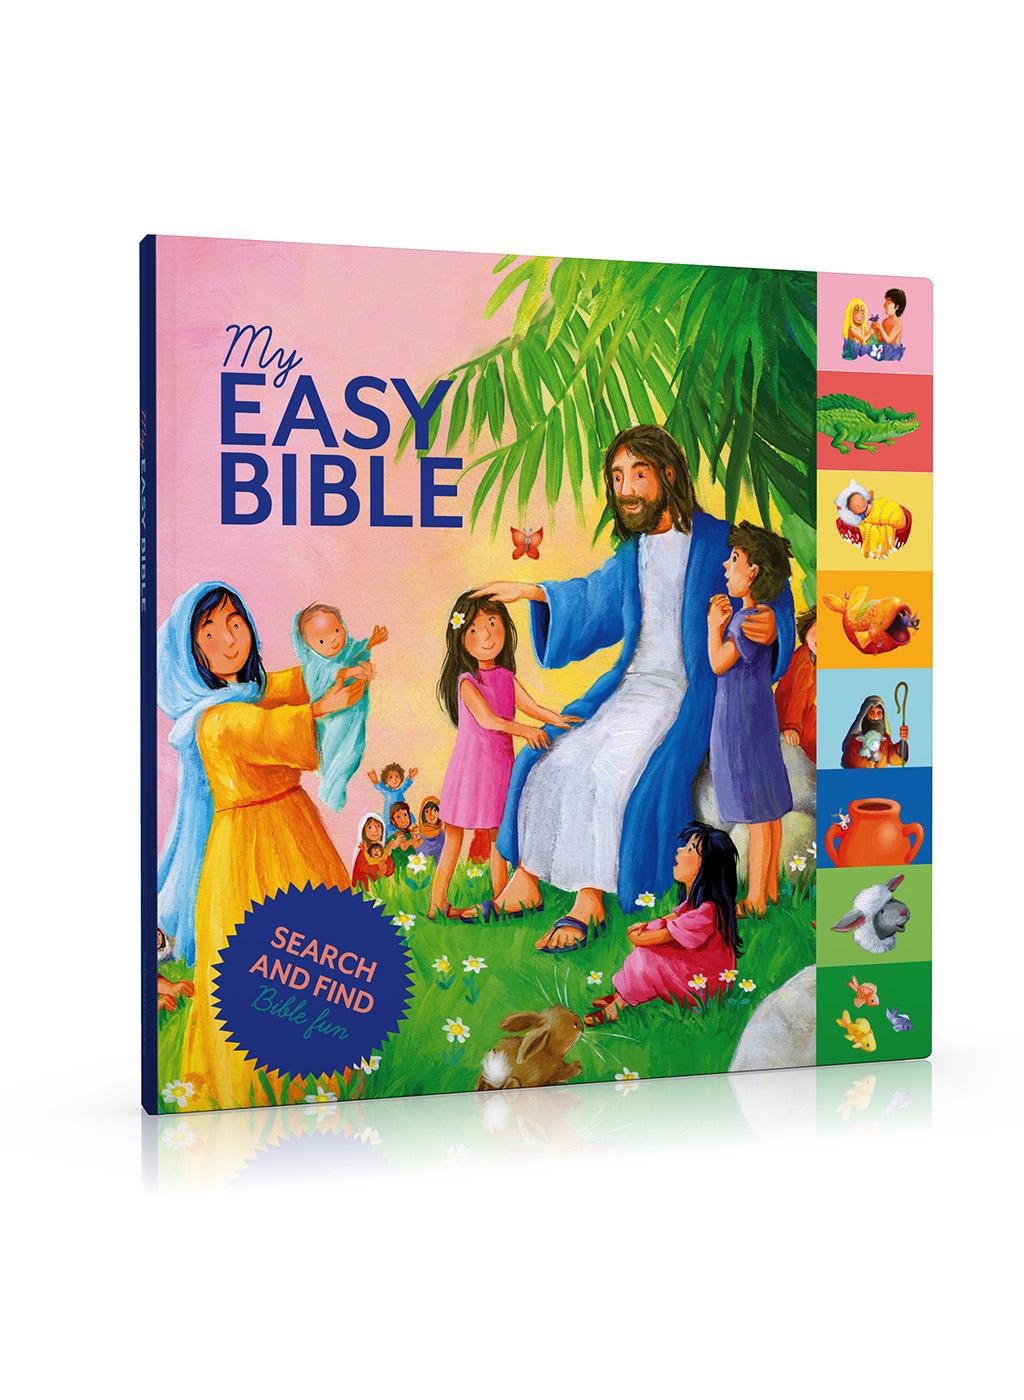 My Easy Bible